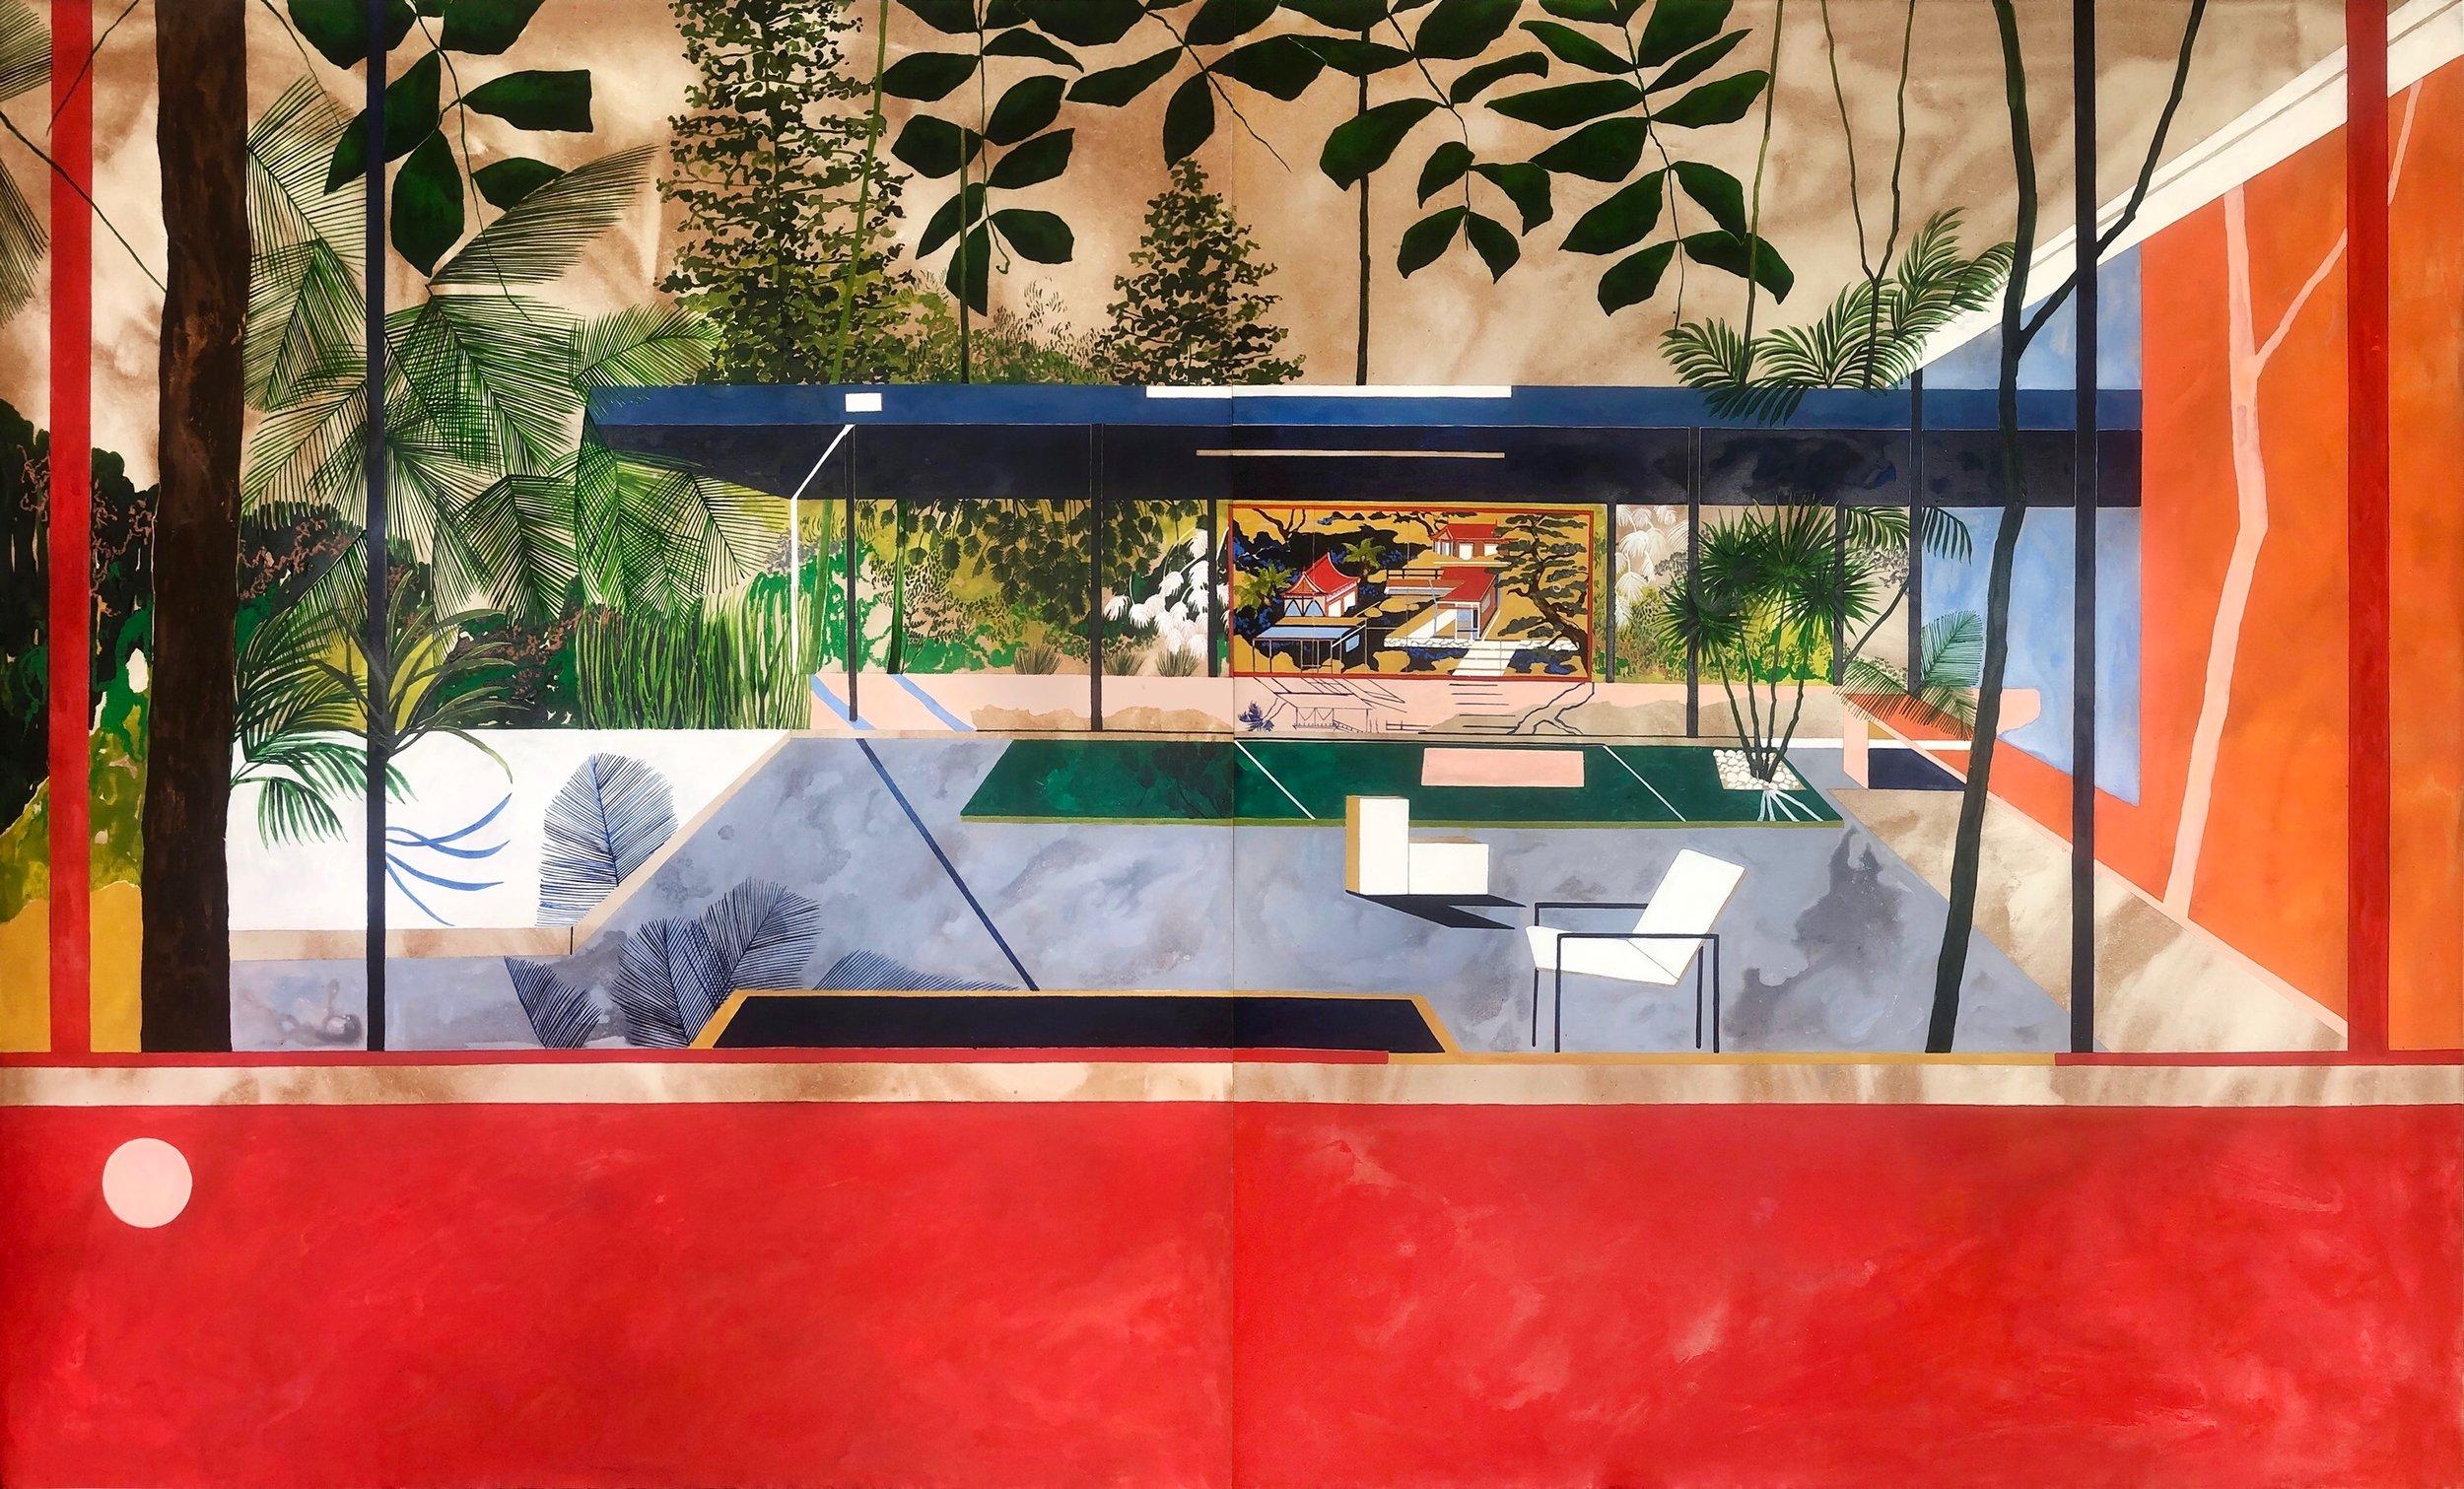 Arusha Gallery , Charlotte Keates,  Tropical Energy , 2019, Oil on board, 52 x 83.5 in.